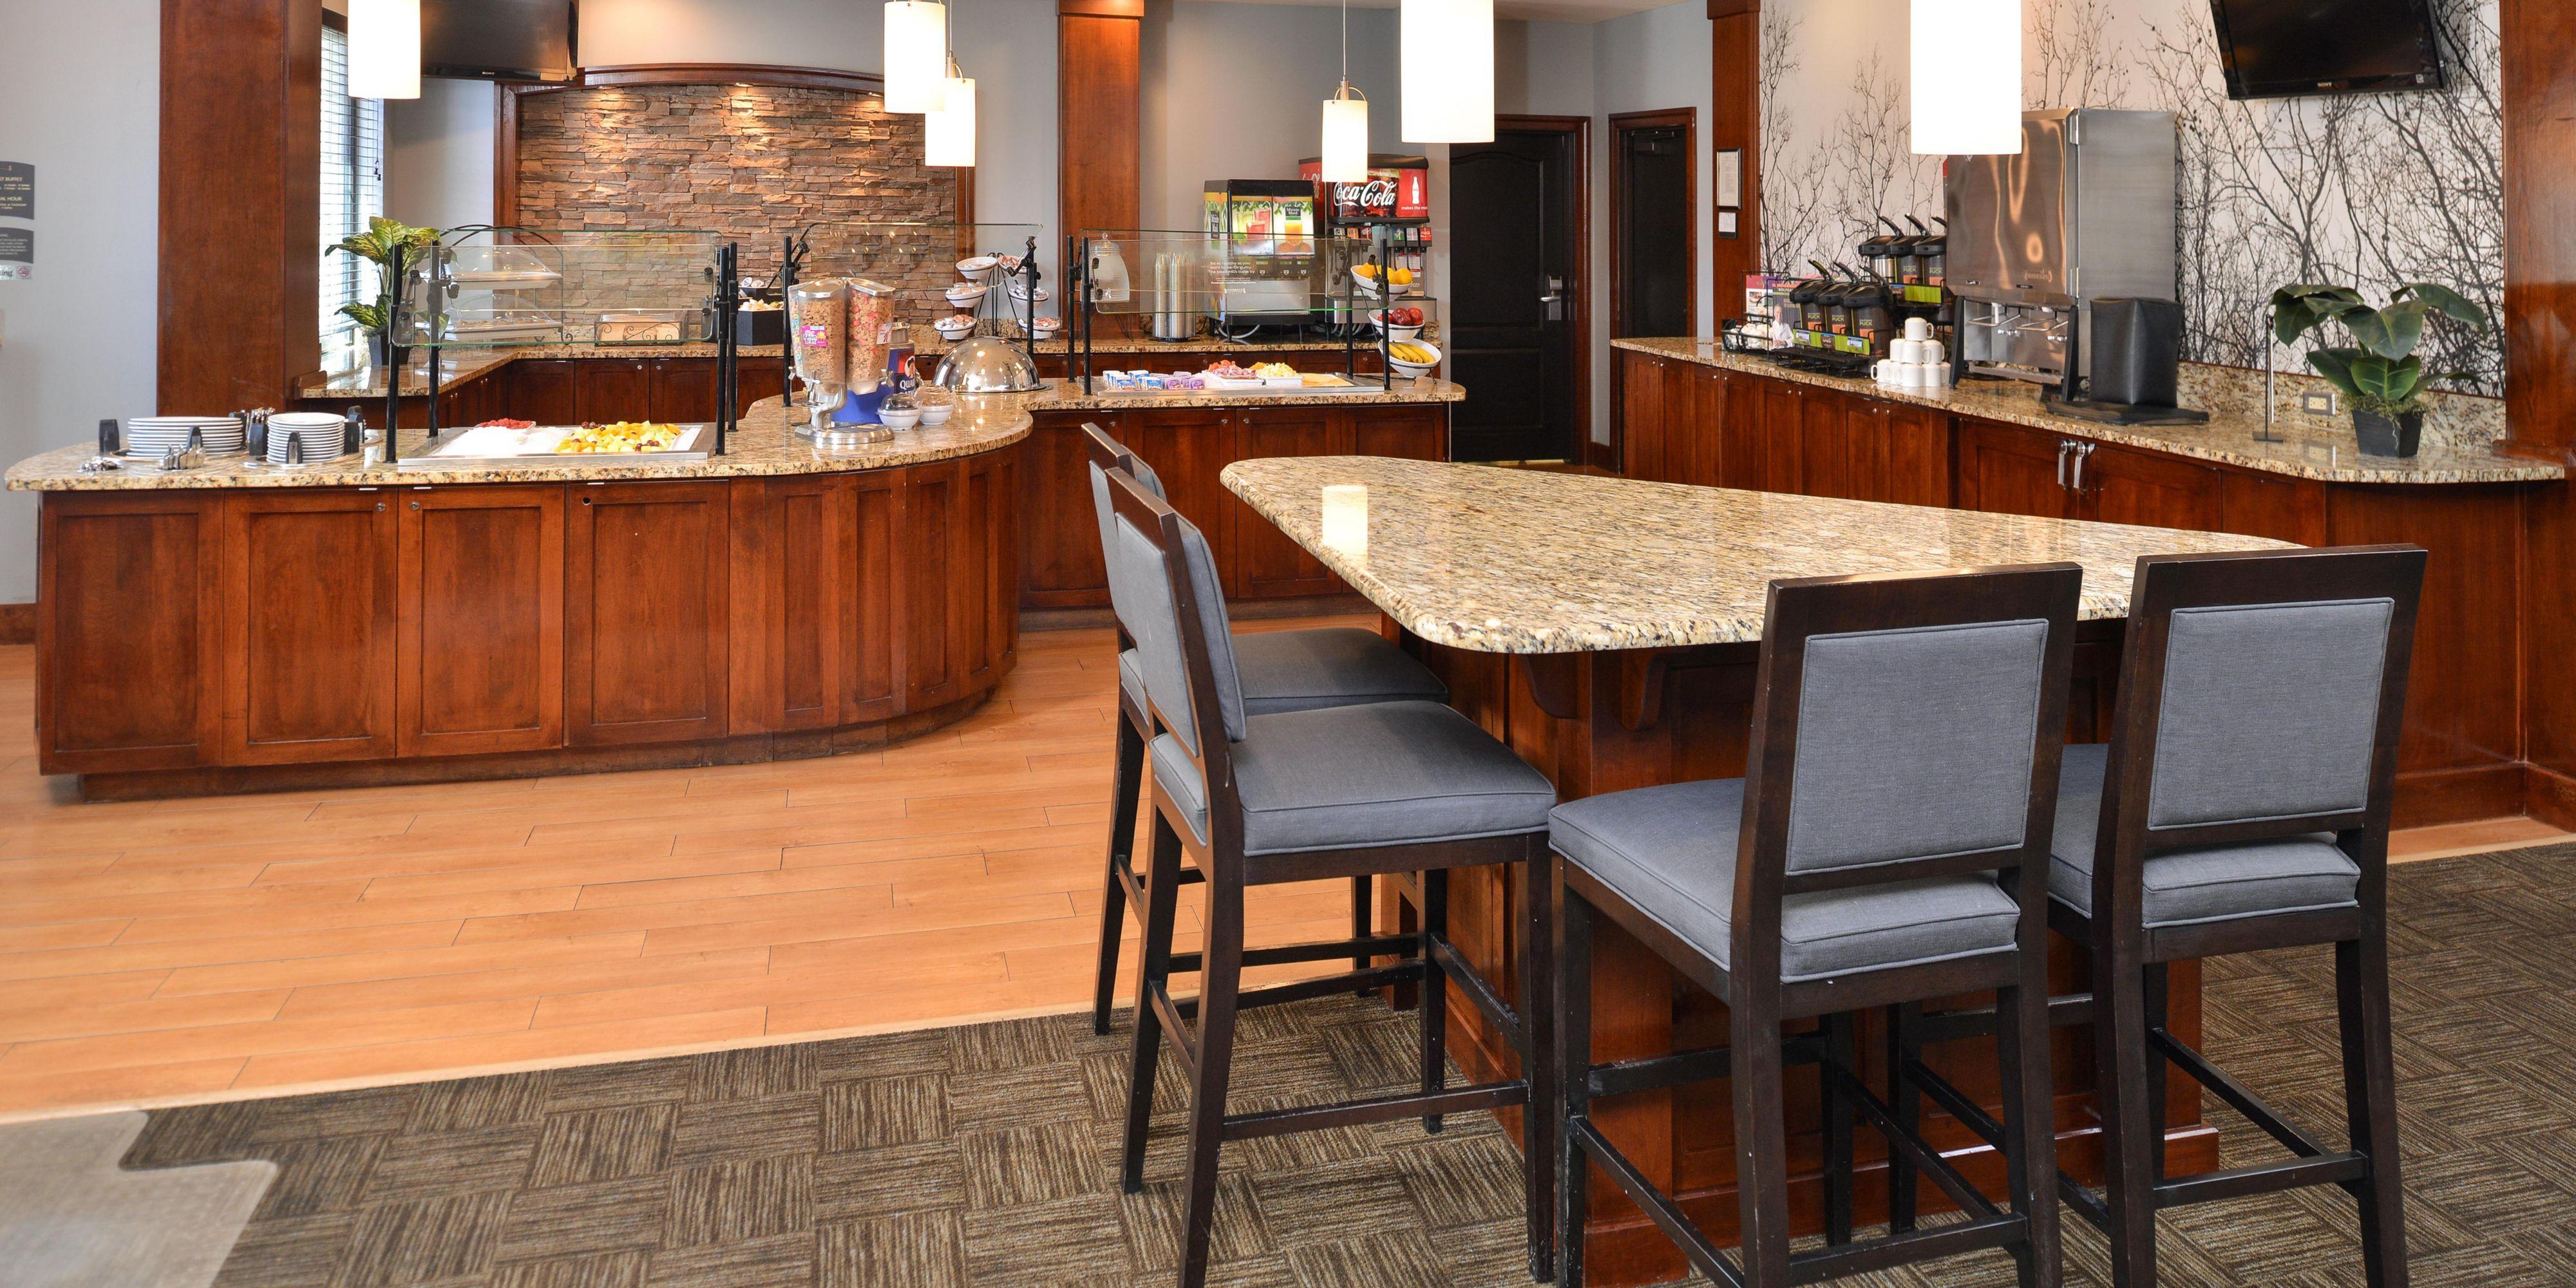 Staybridge Suites San Antonio - Stone Oak image 3